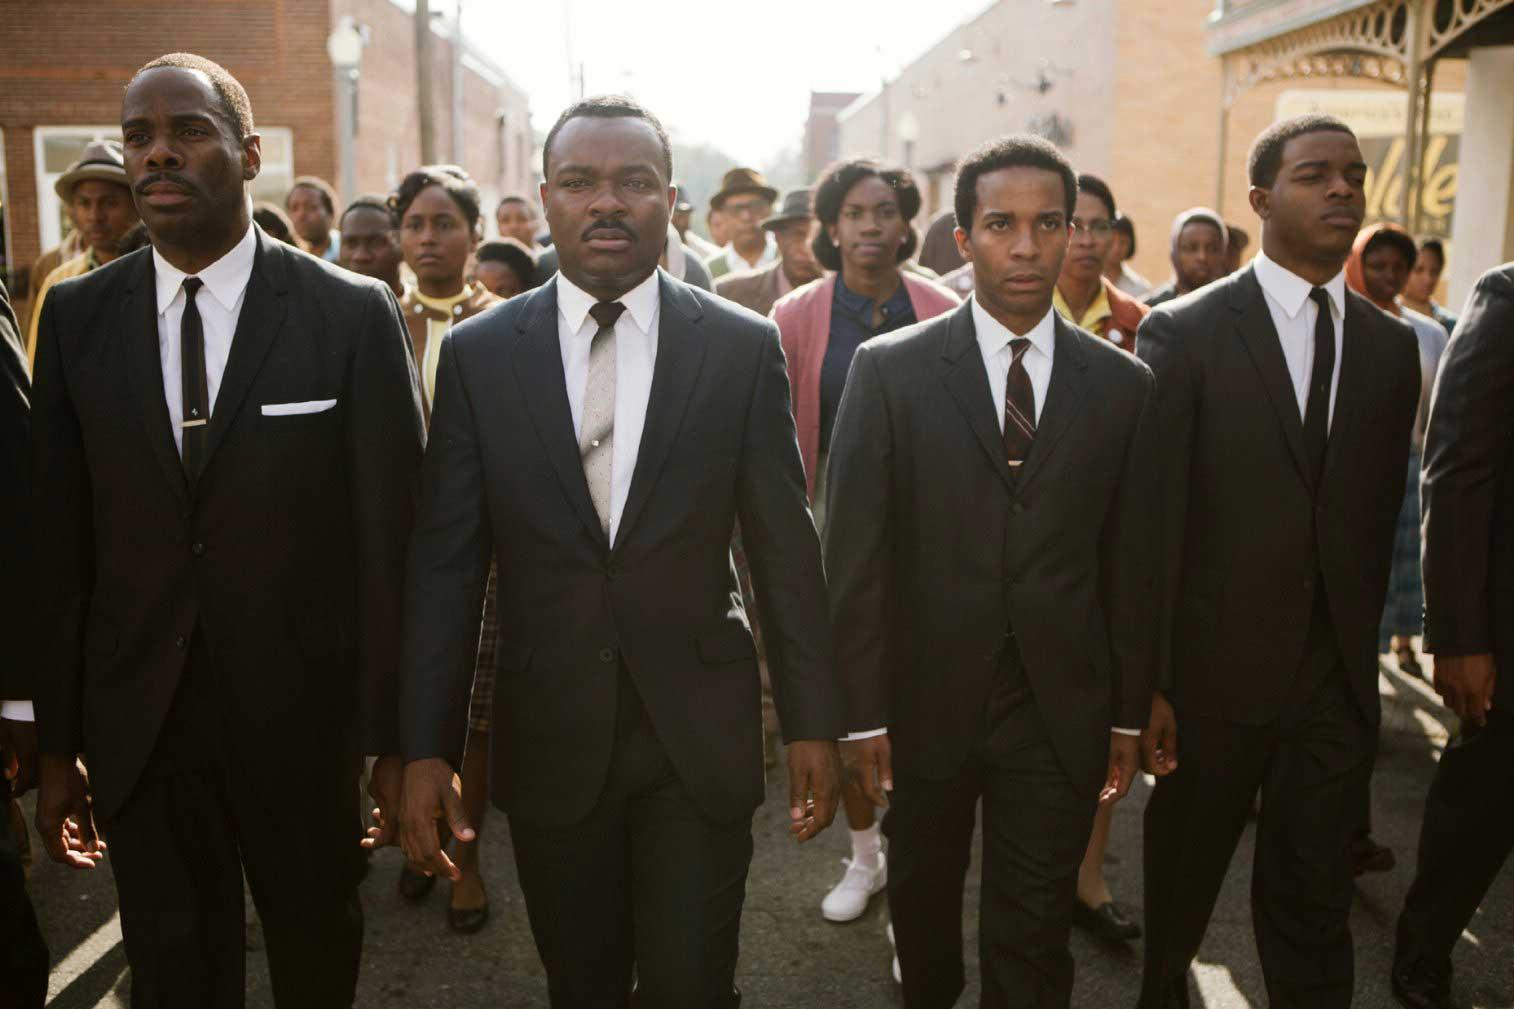 Colman Domingo, David Oyelowo, André Holland and Stephan James in Selma.